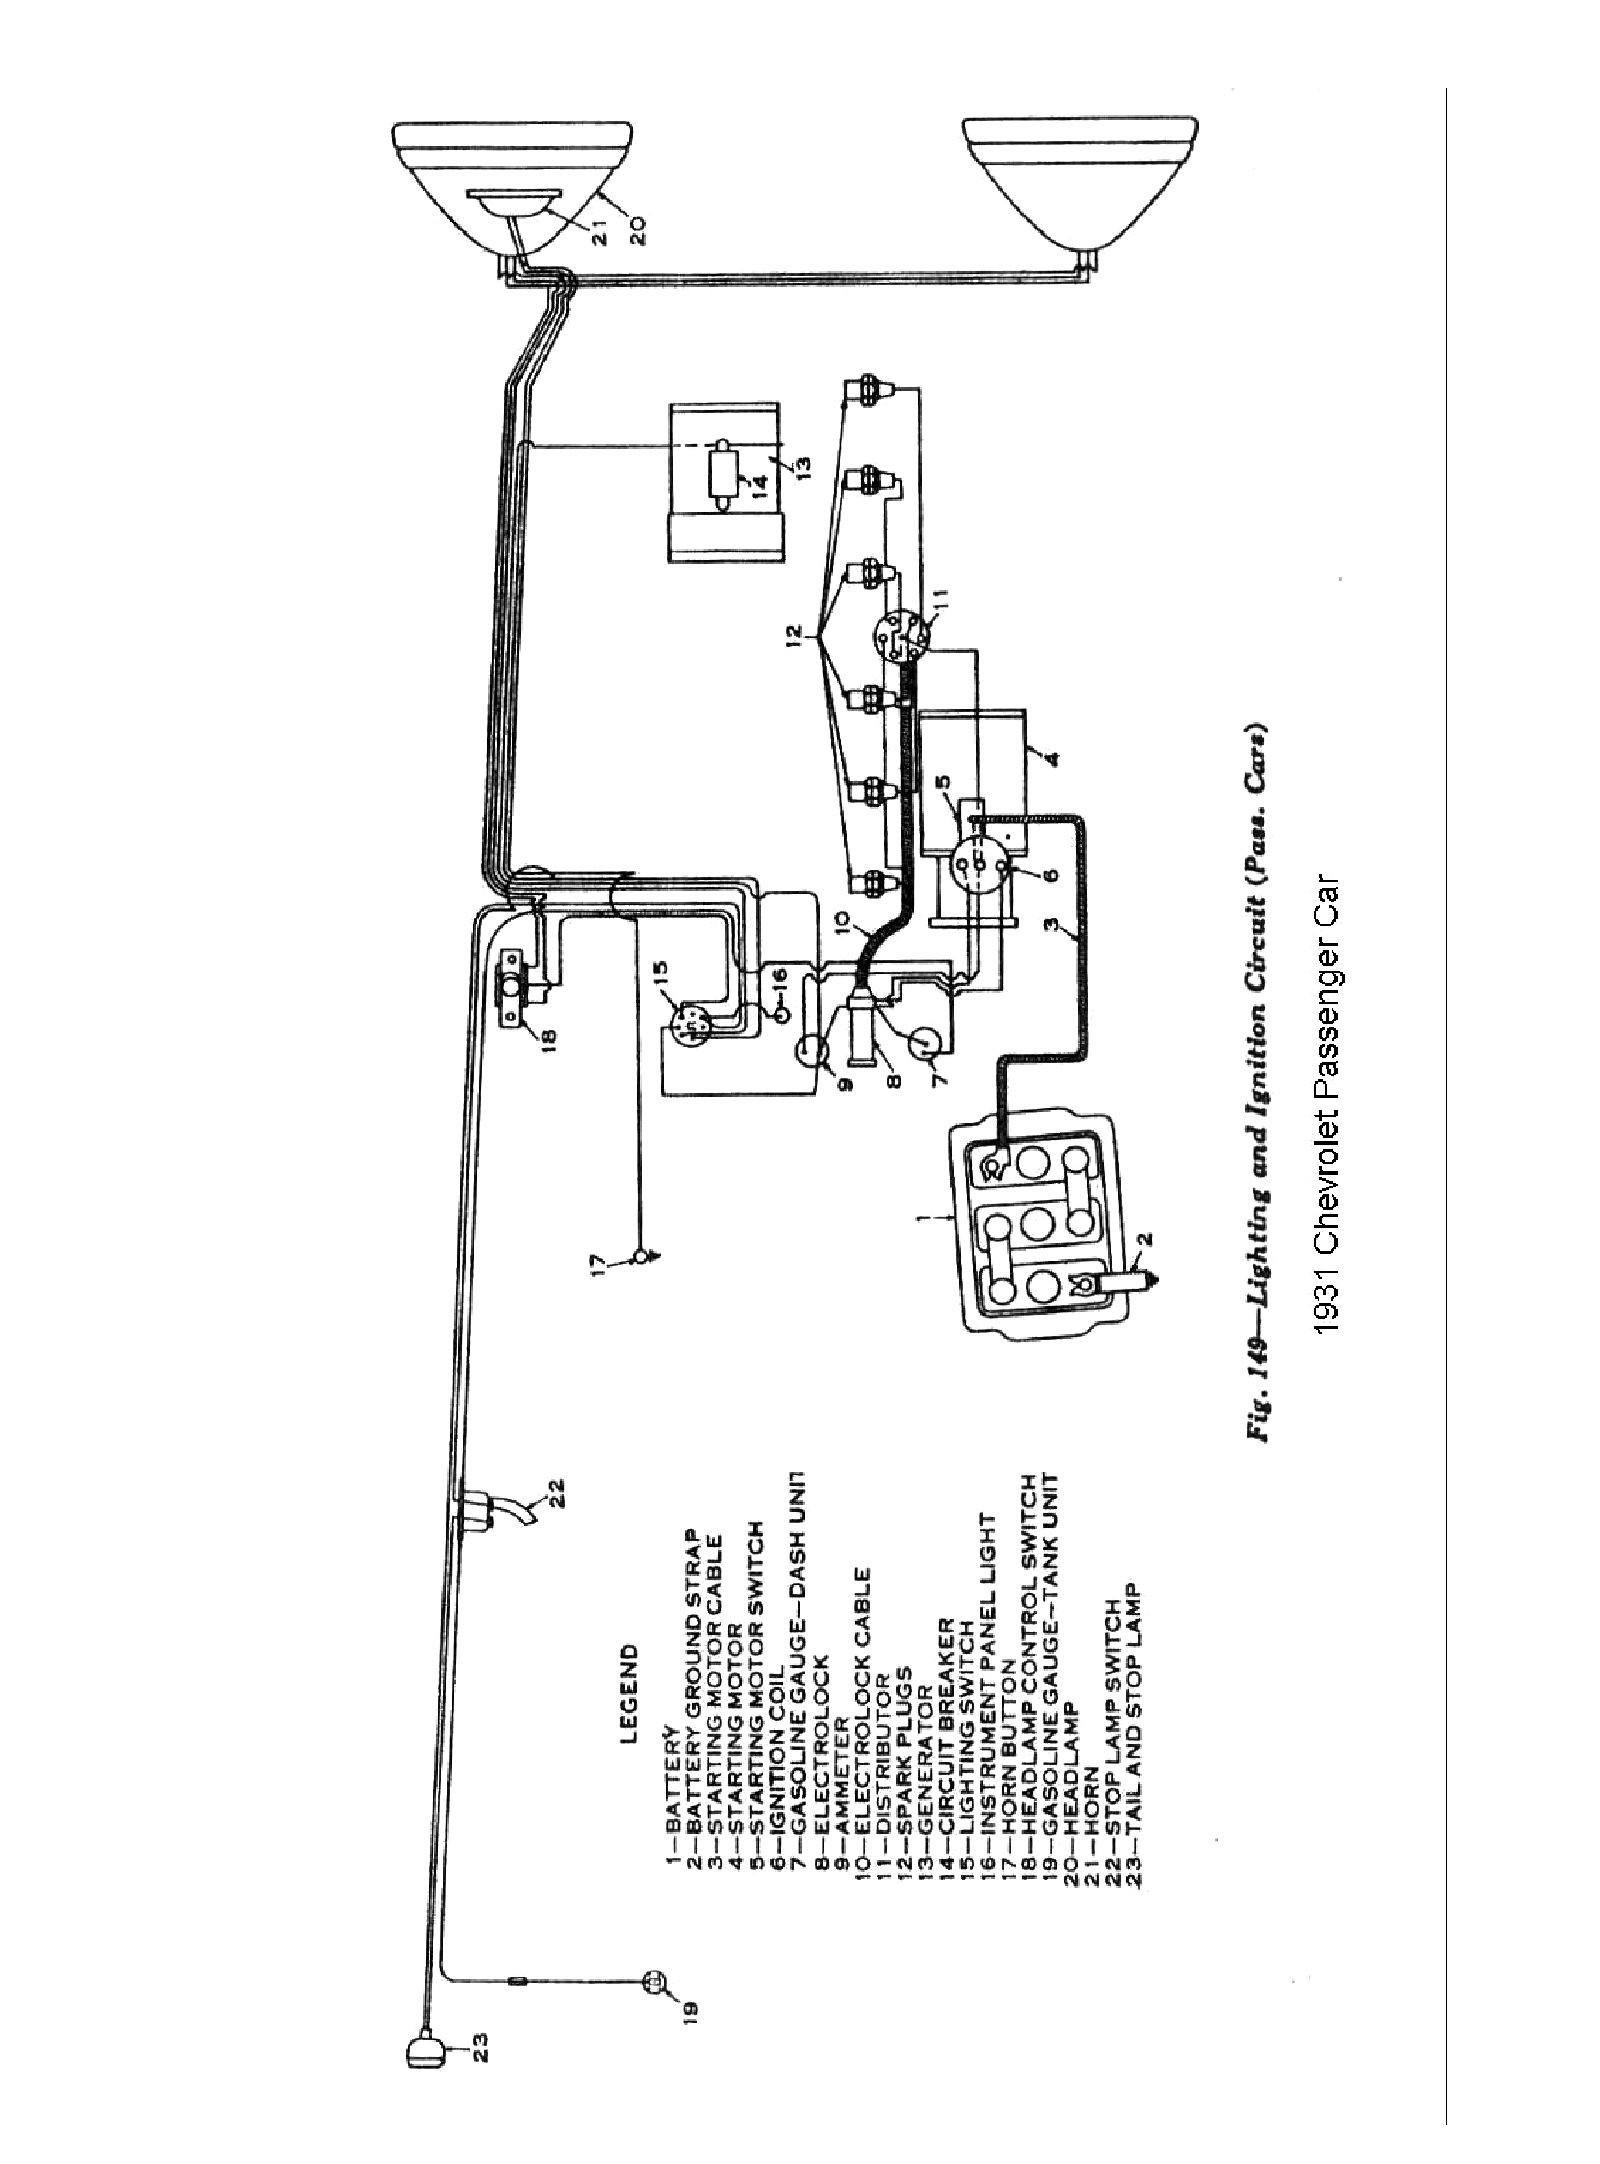 dolphin wiring diagrams nnj kickernight de \u2022dolphin wiring diagrams wiring schematic diagram rh 28 twizer co